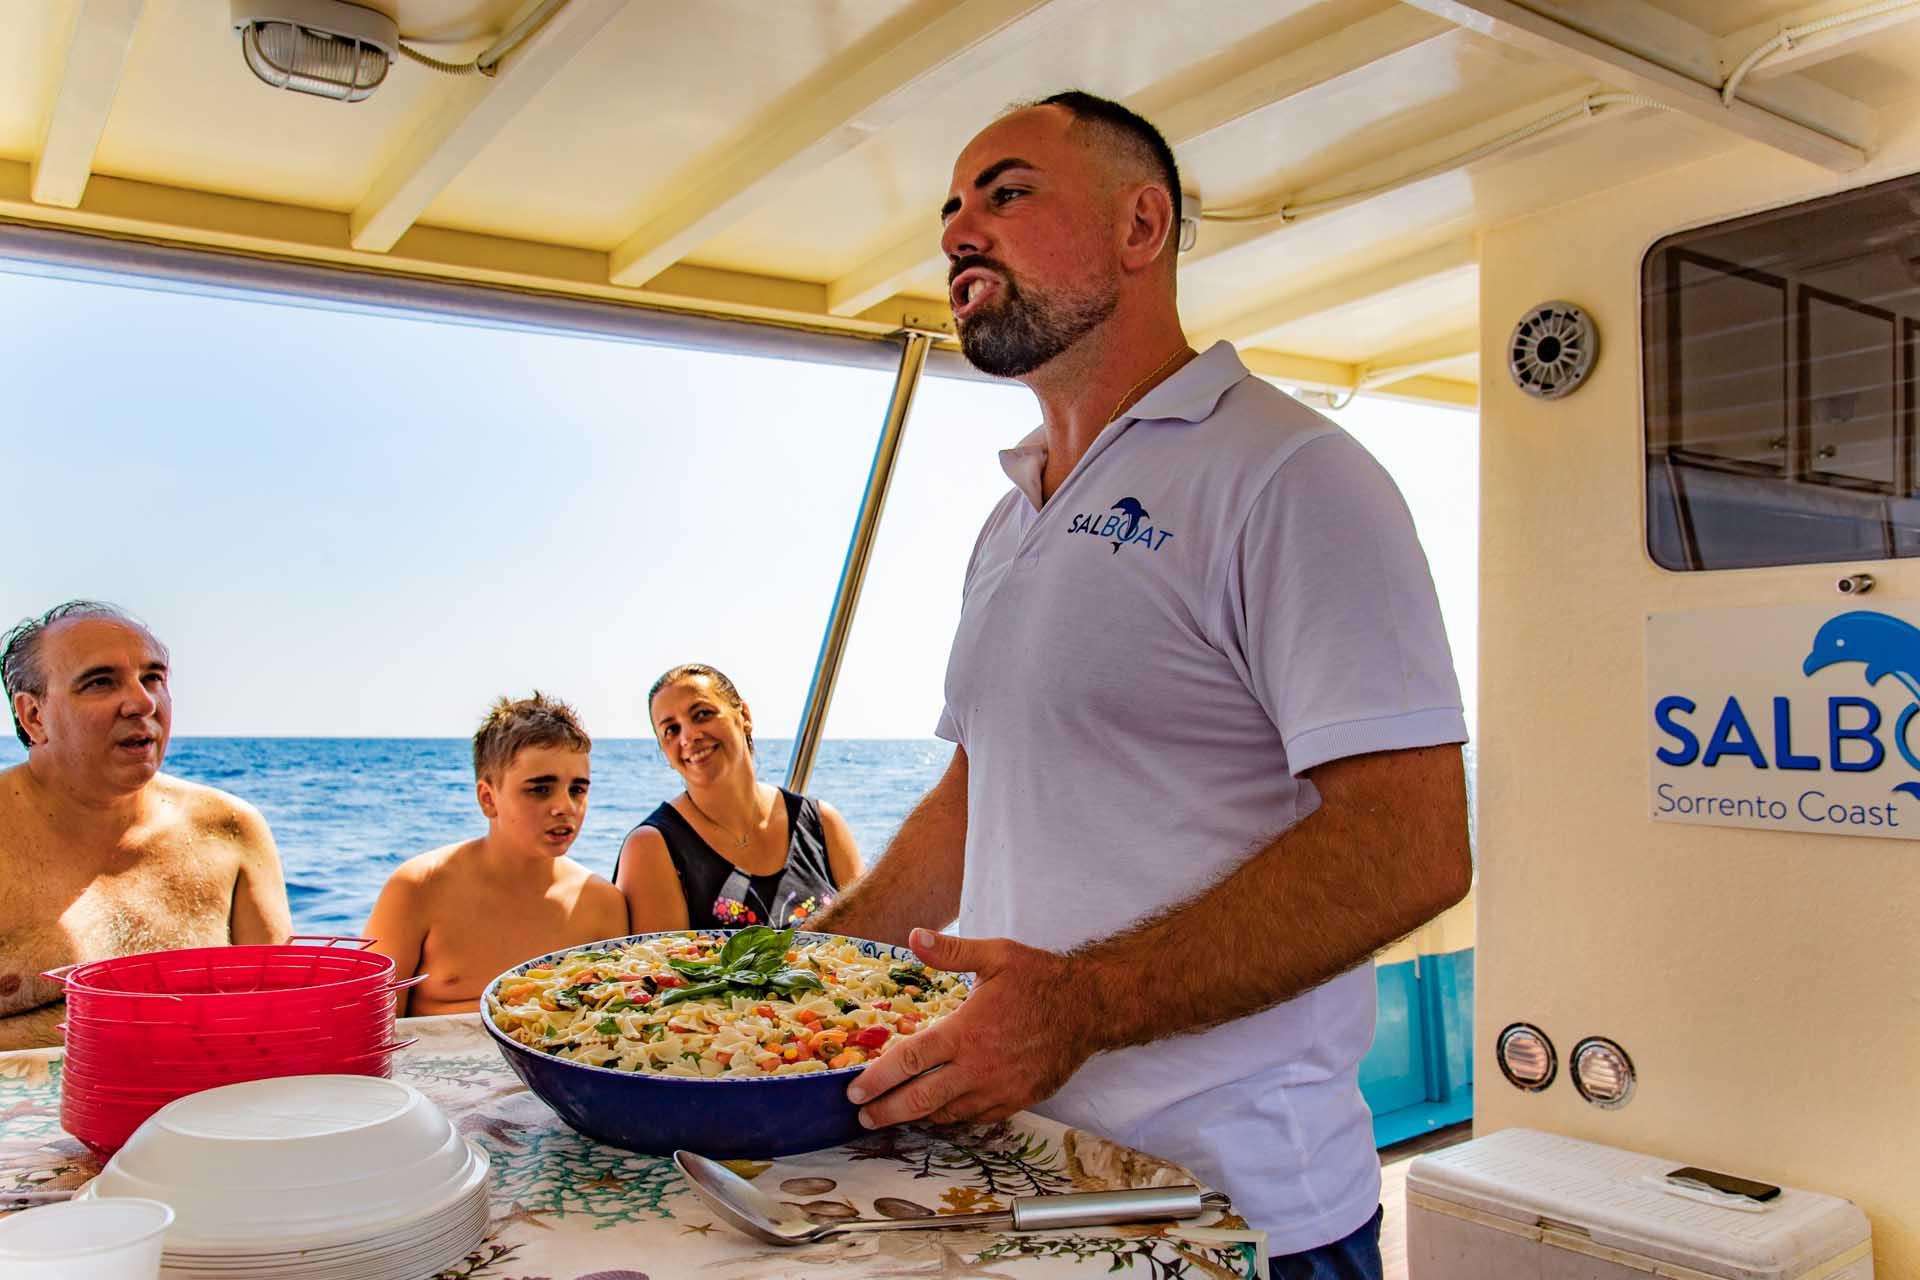 Pescaturismo a Sorrento con pasta a pranzo